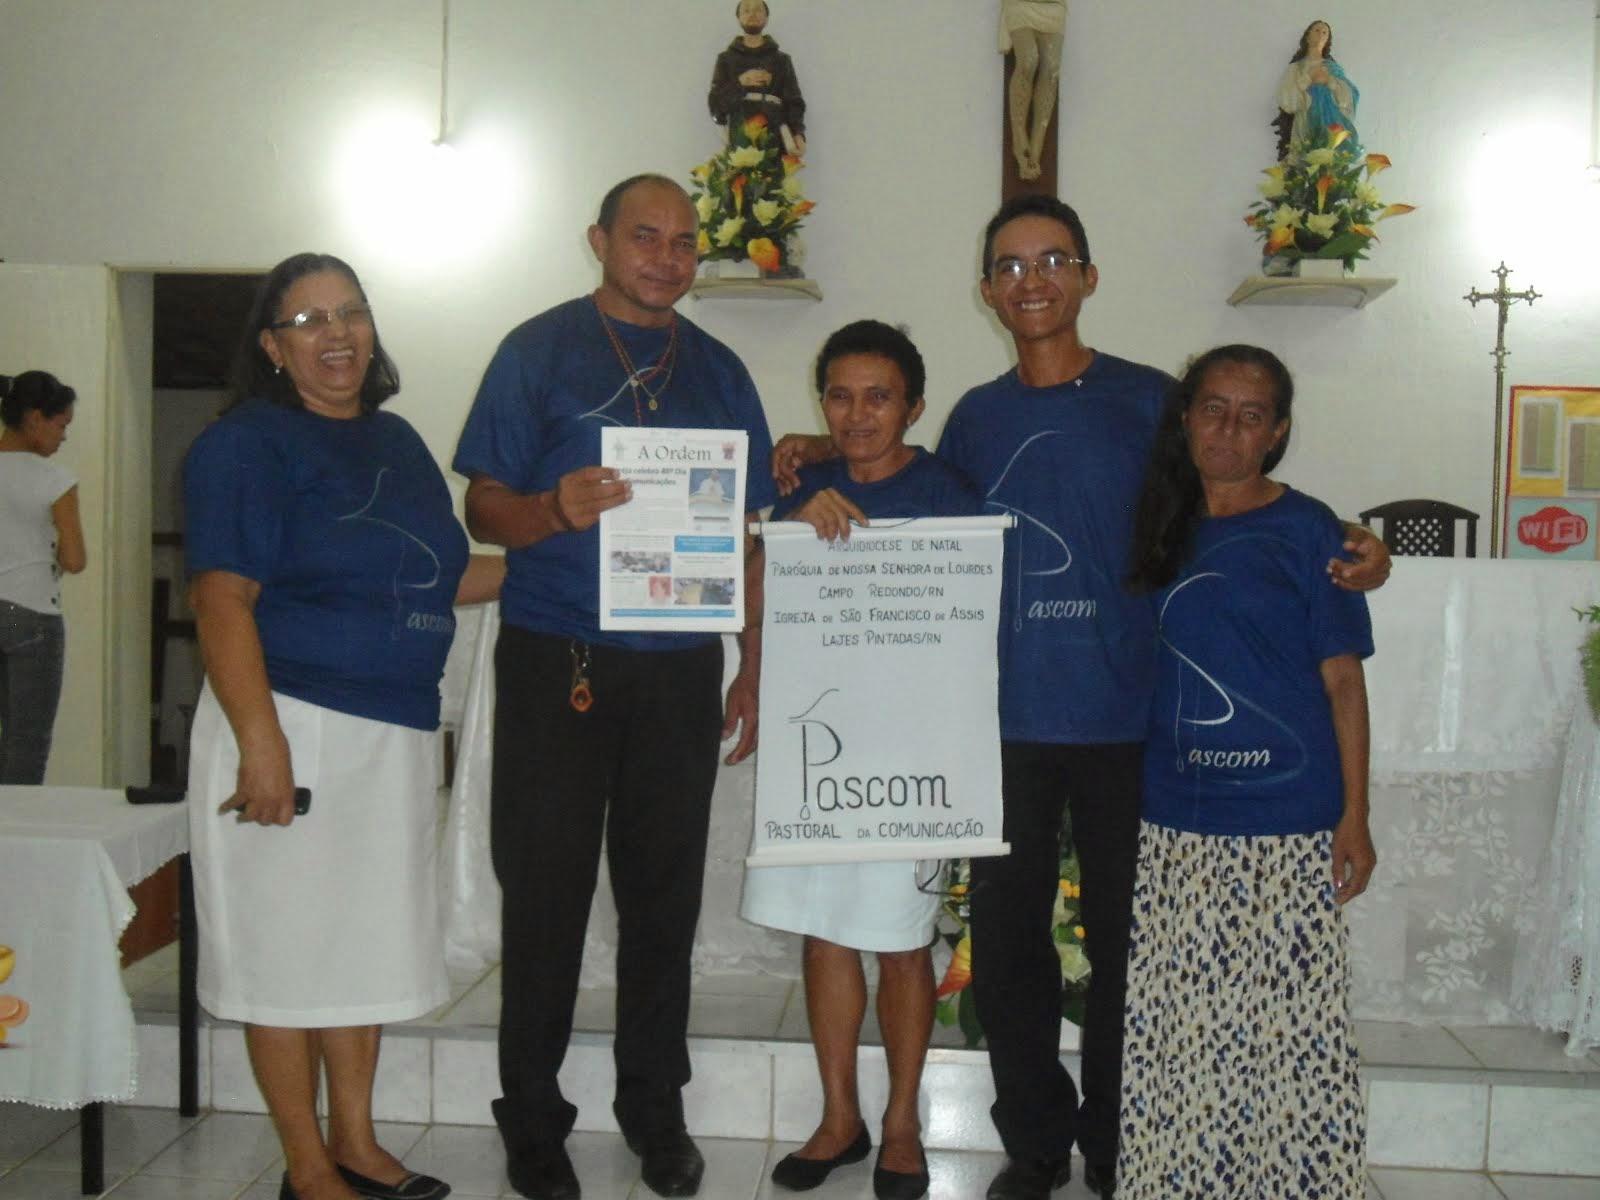 PASCOM - LAJES PINTADAS/RN